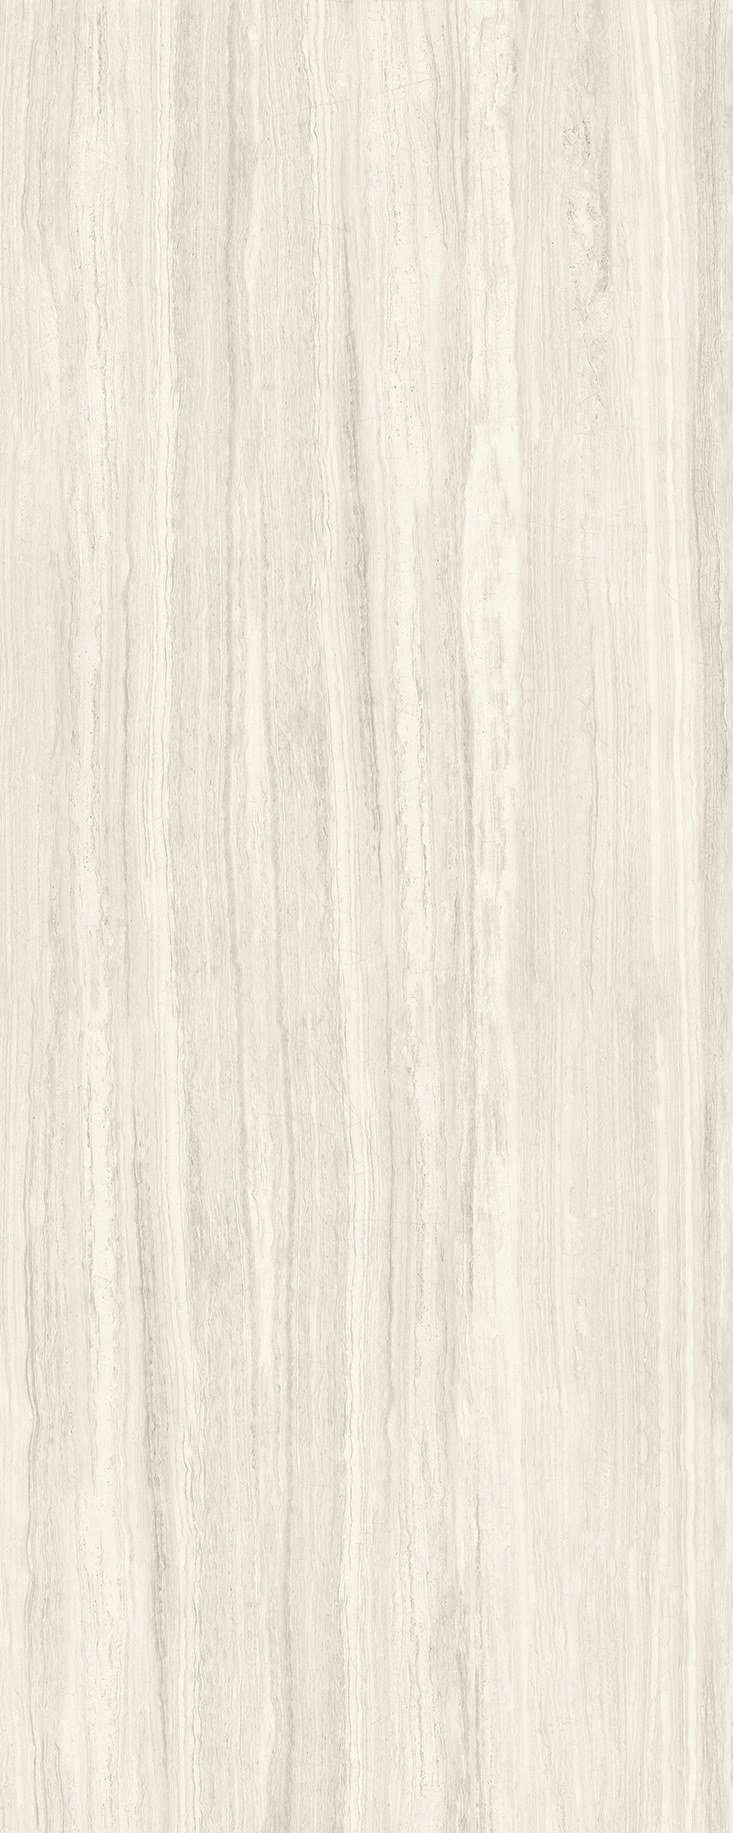 Rift Blanco Natural / Natural 100x250 cm